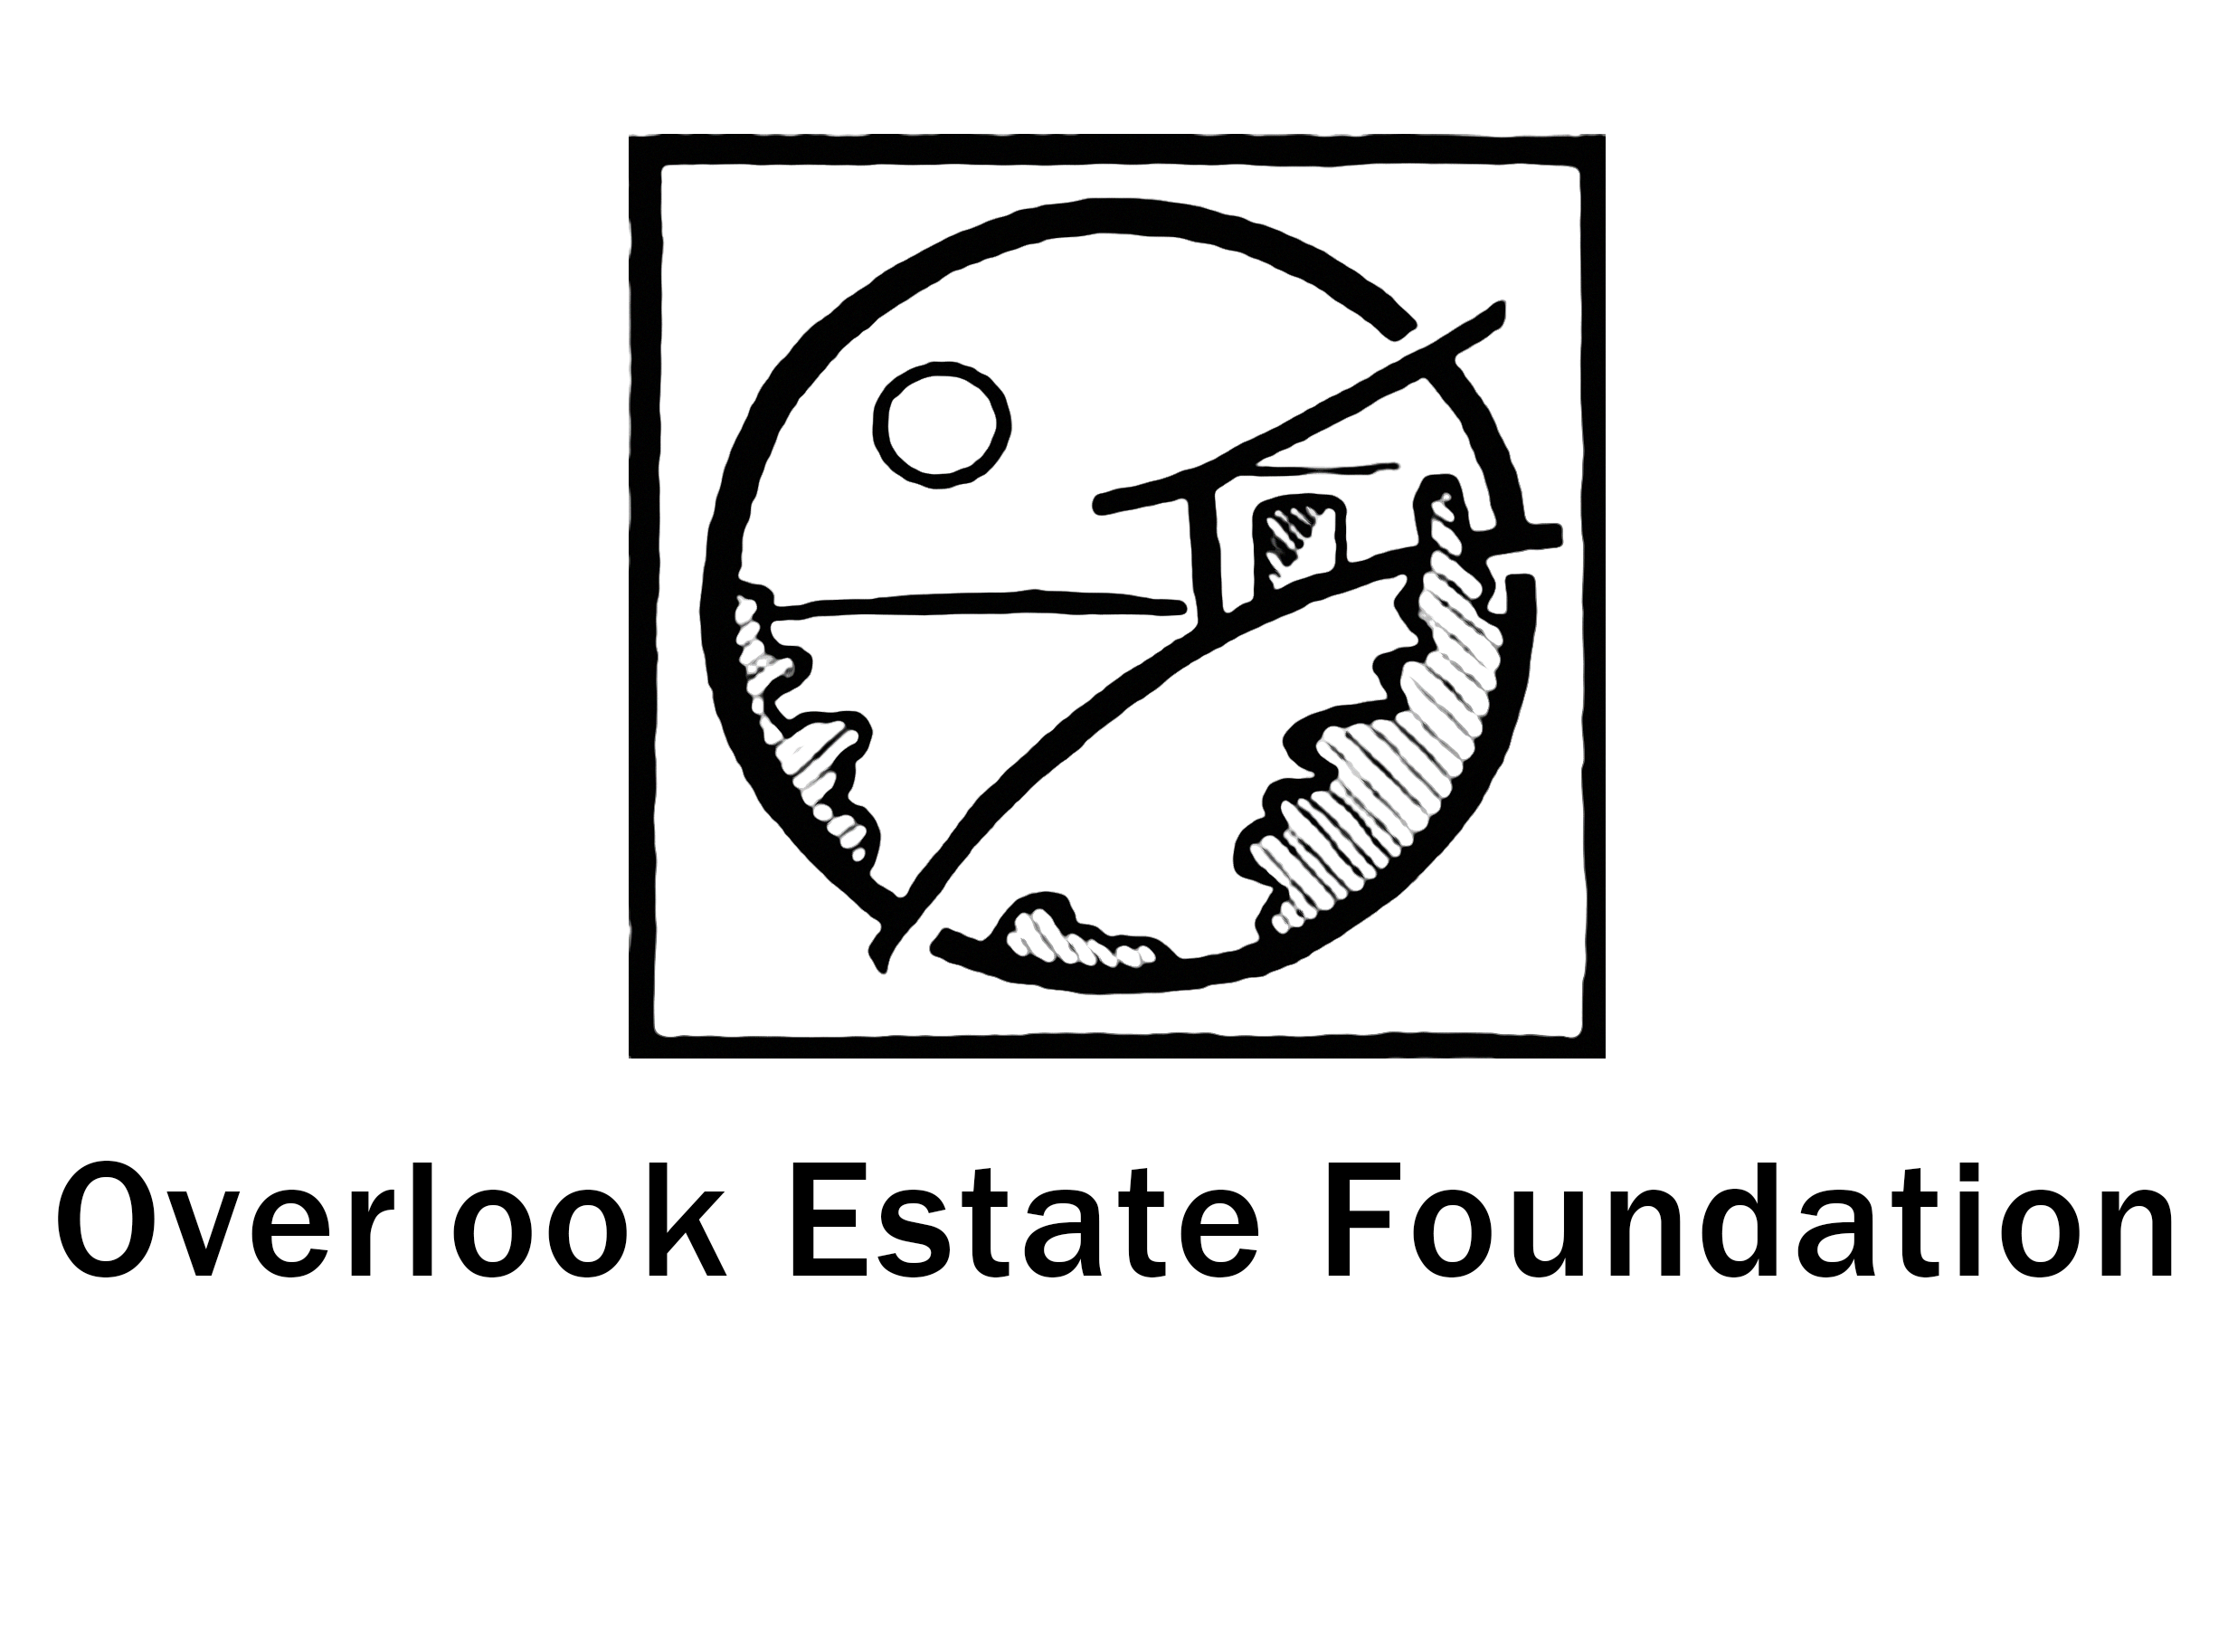 Overlook Estate Foundation